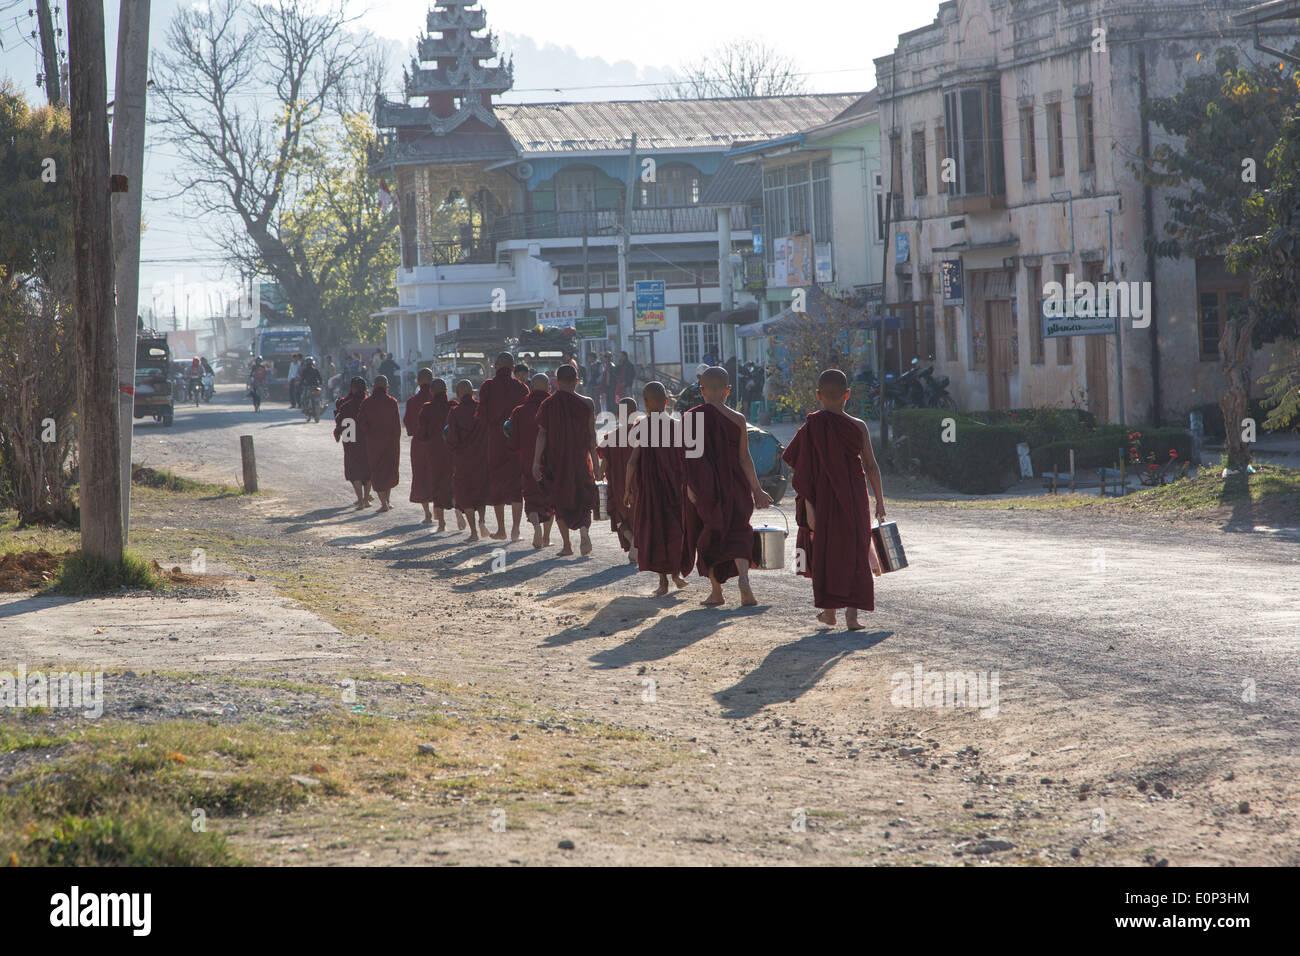 Monks collecting alms, Kalaw, Myanmar Stock Photo